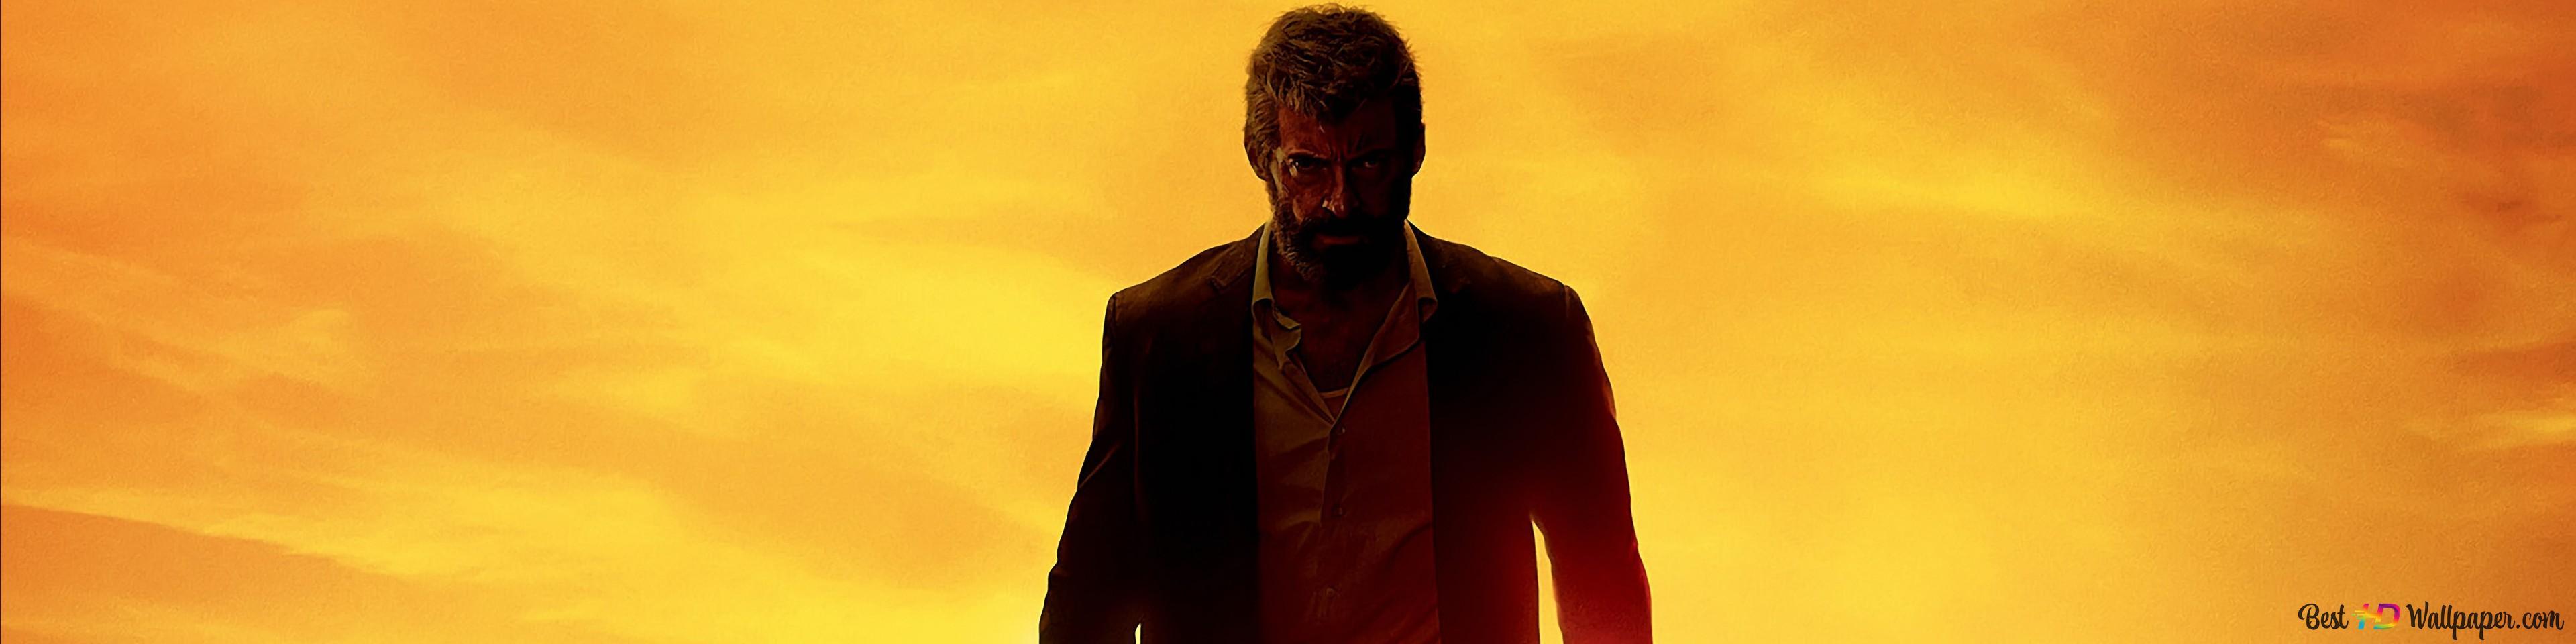 Logan Wolverine Hd Wallpaper Download